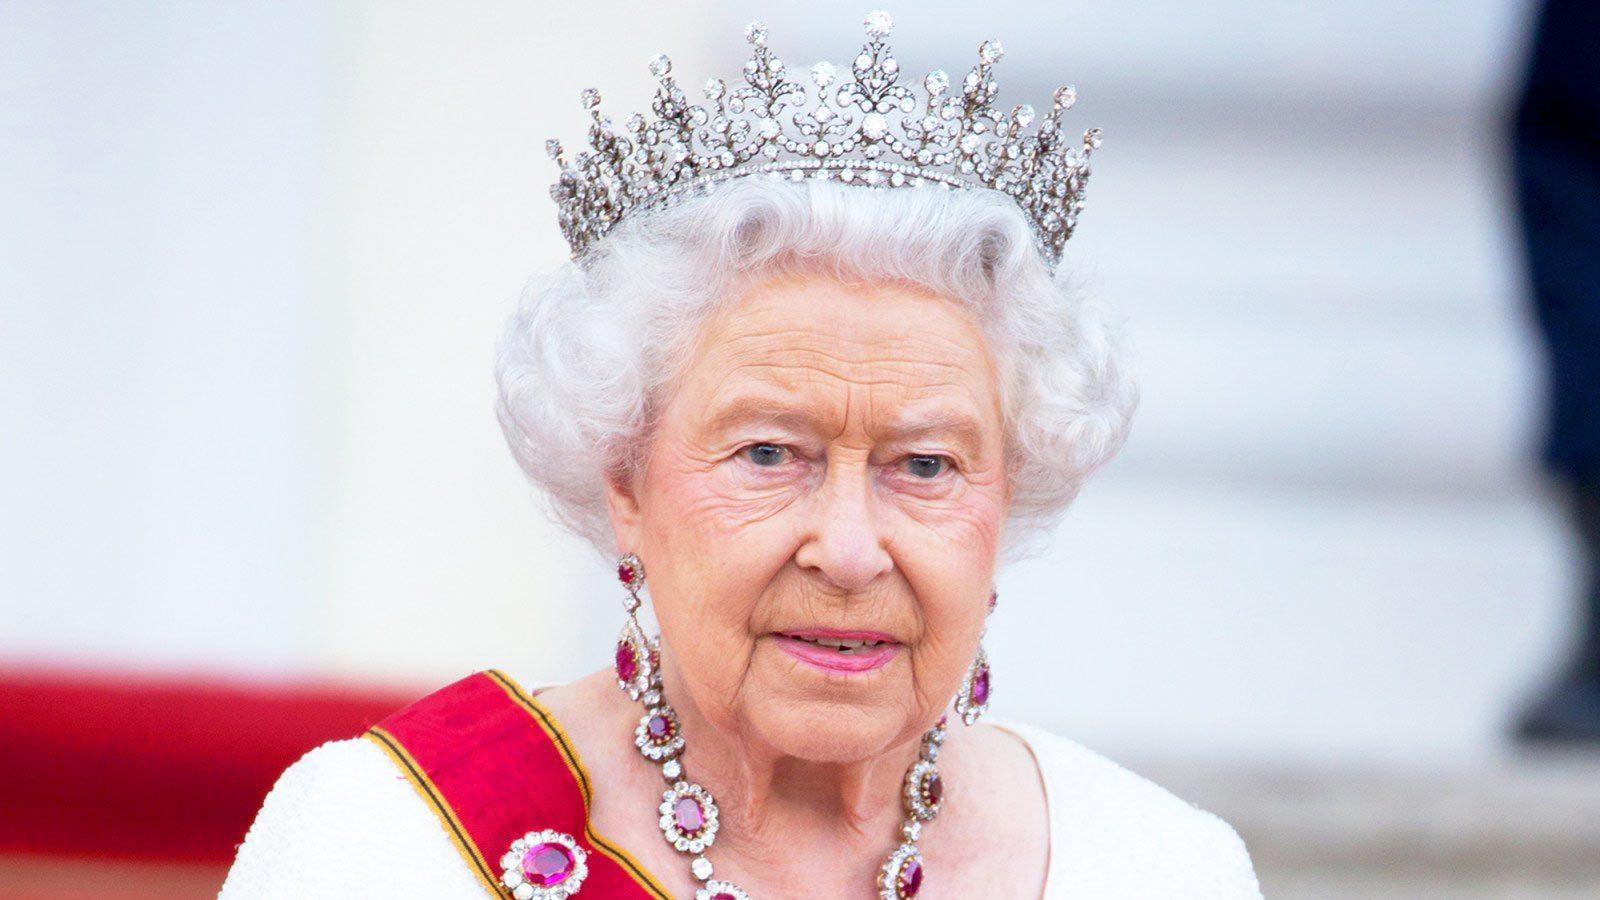 regina-elisabeta-a-iia-ia-eliminat-pe-printul-andrew-